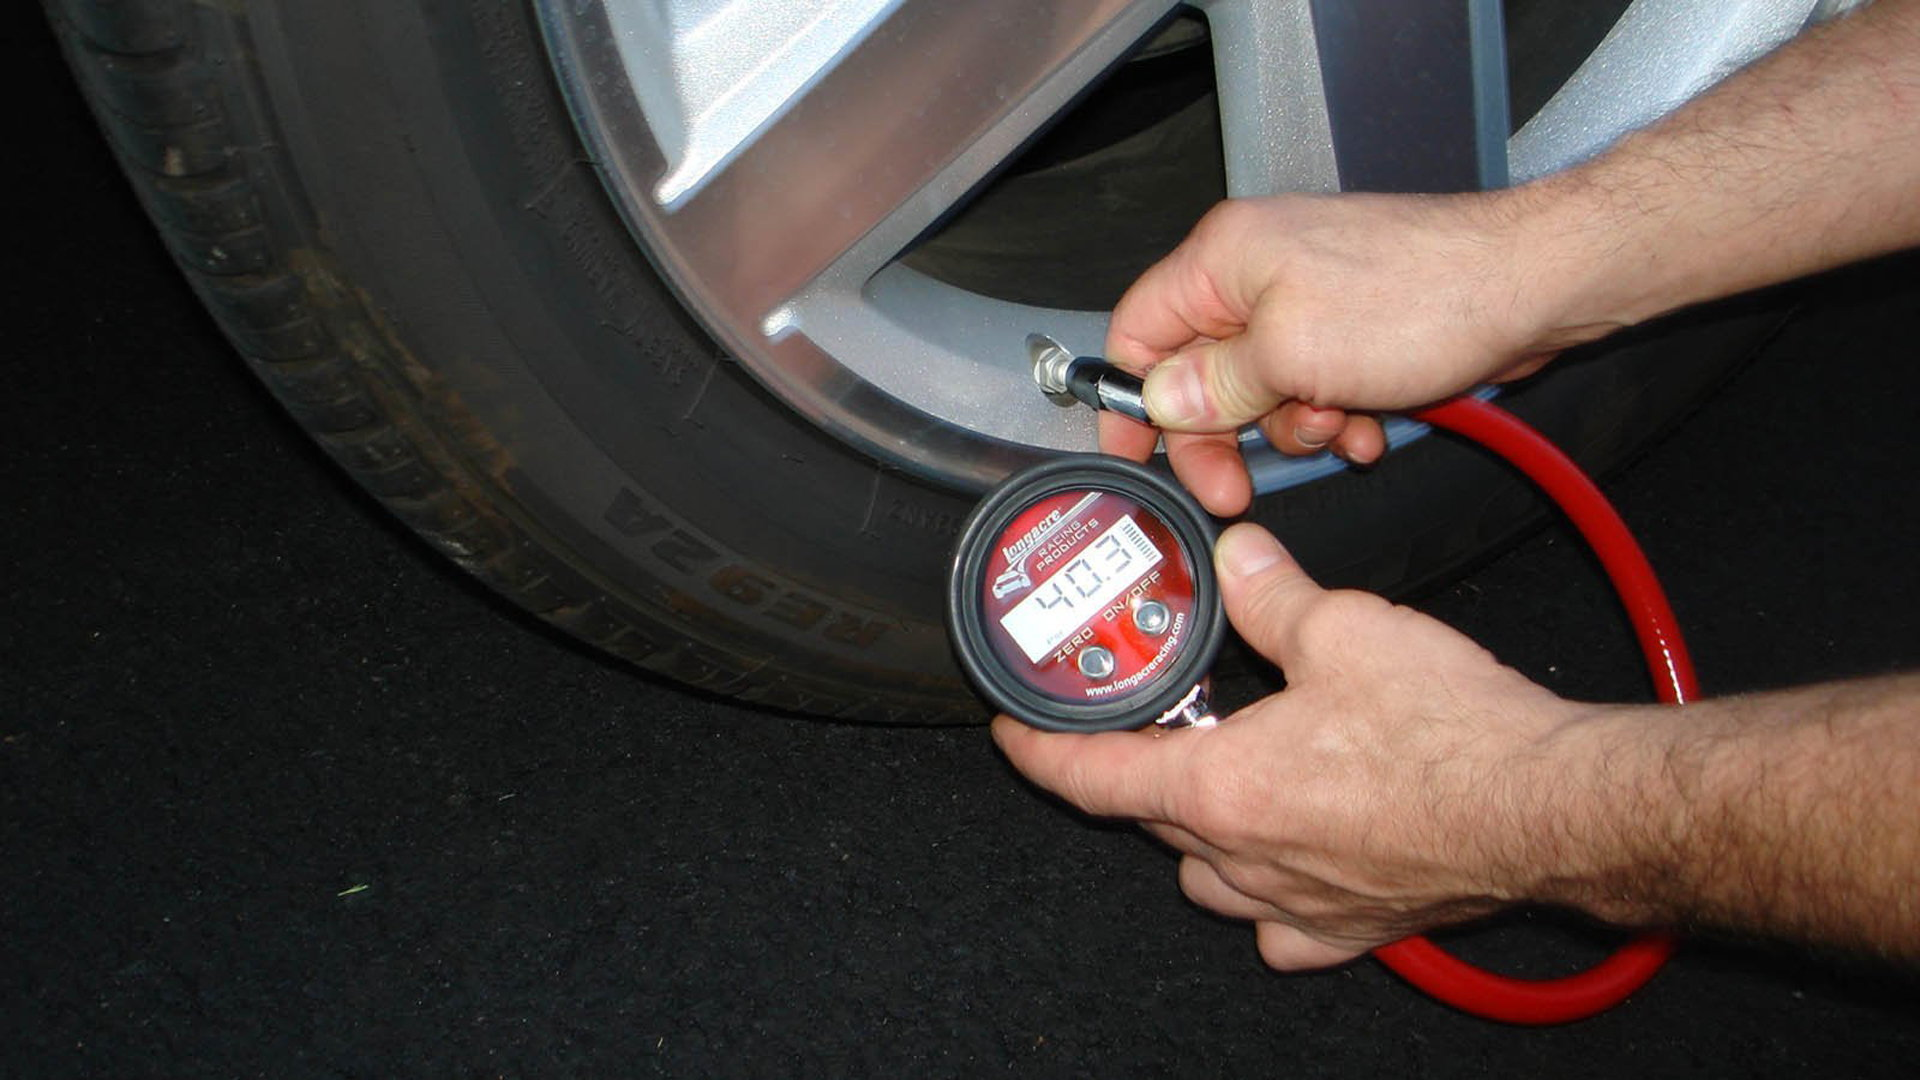 Mercedes Benz E Class W211 W212 How To Reset Tire